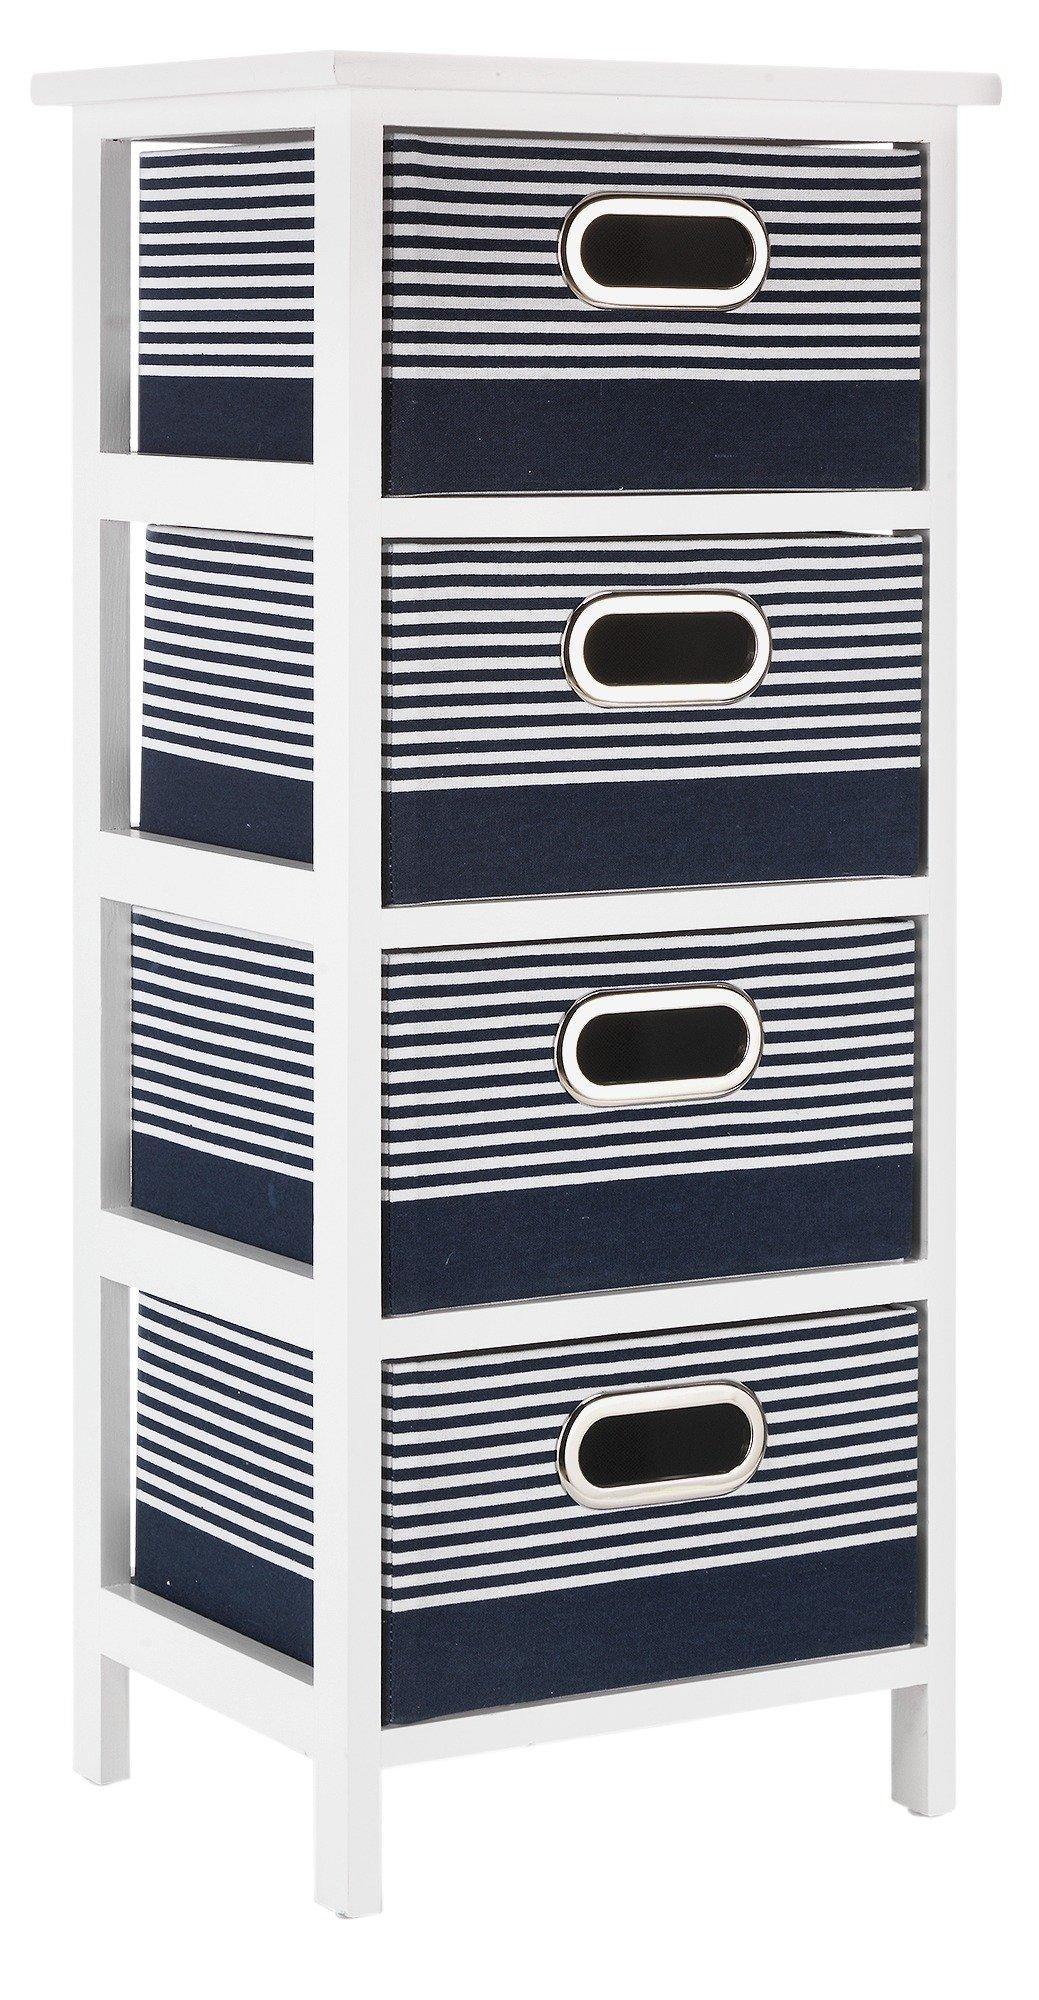 Argos Home Nautical 4 Drawer Solid Wood Storage Unit  sc 1 st  Argos & Buy Argos Home 4 Drawer Canvas Bathroom Storage Units - Grey ...